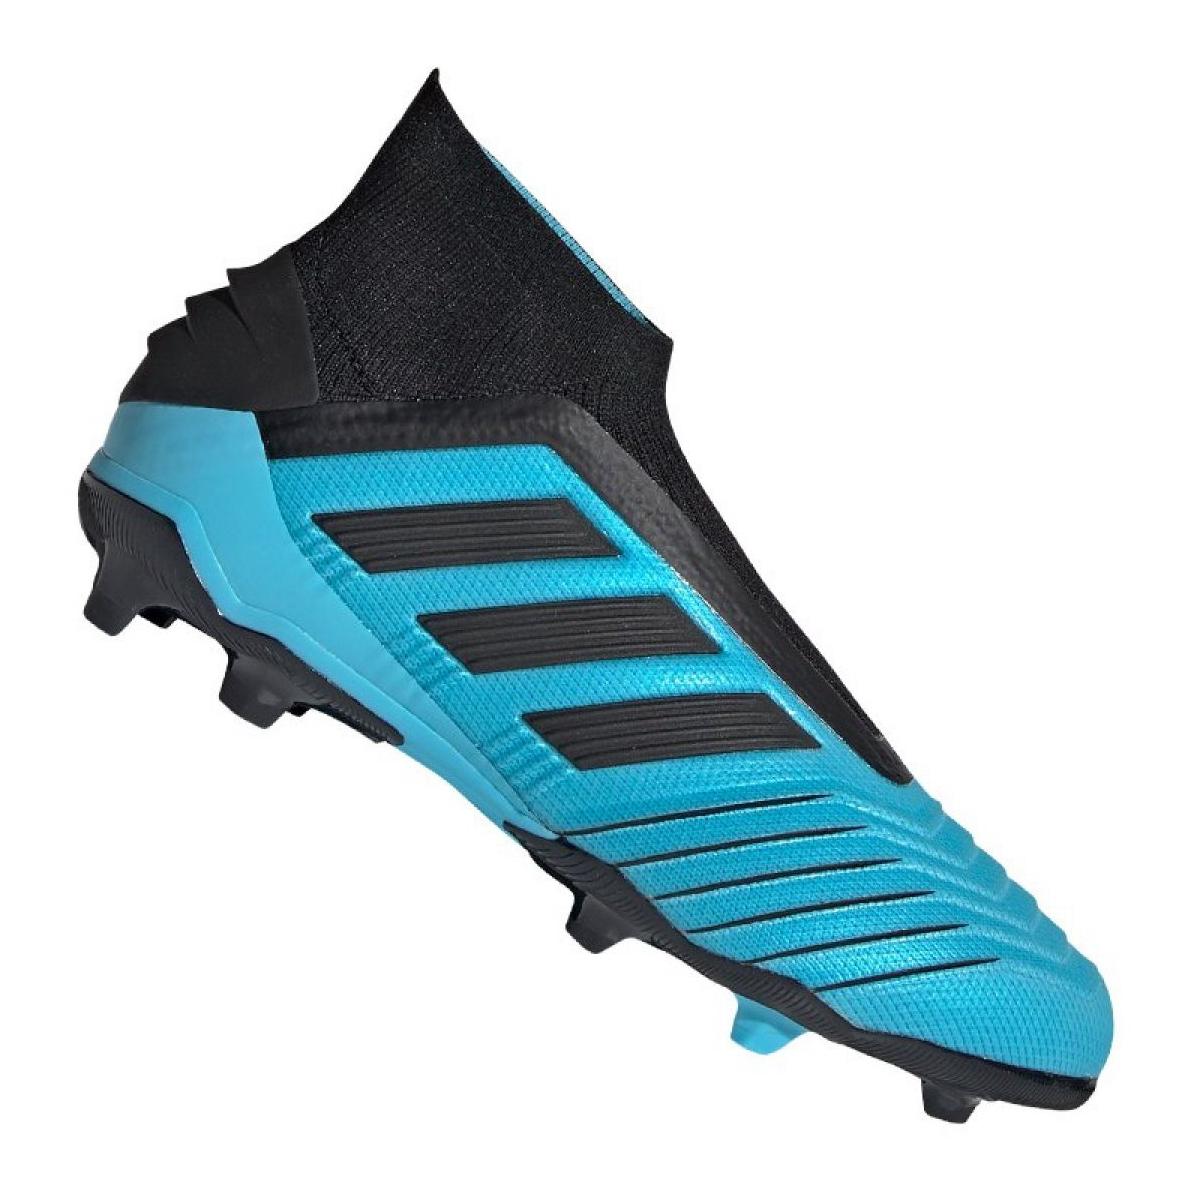 Football boots adidas Predator 19+ Fg